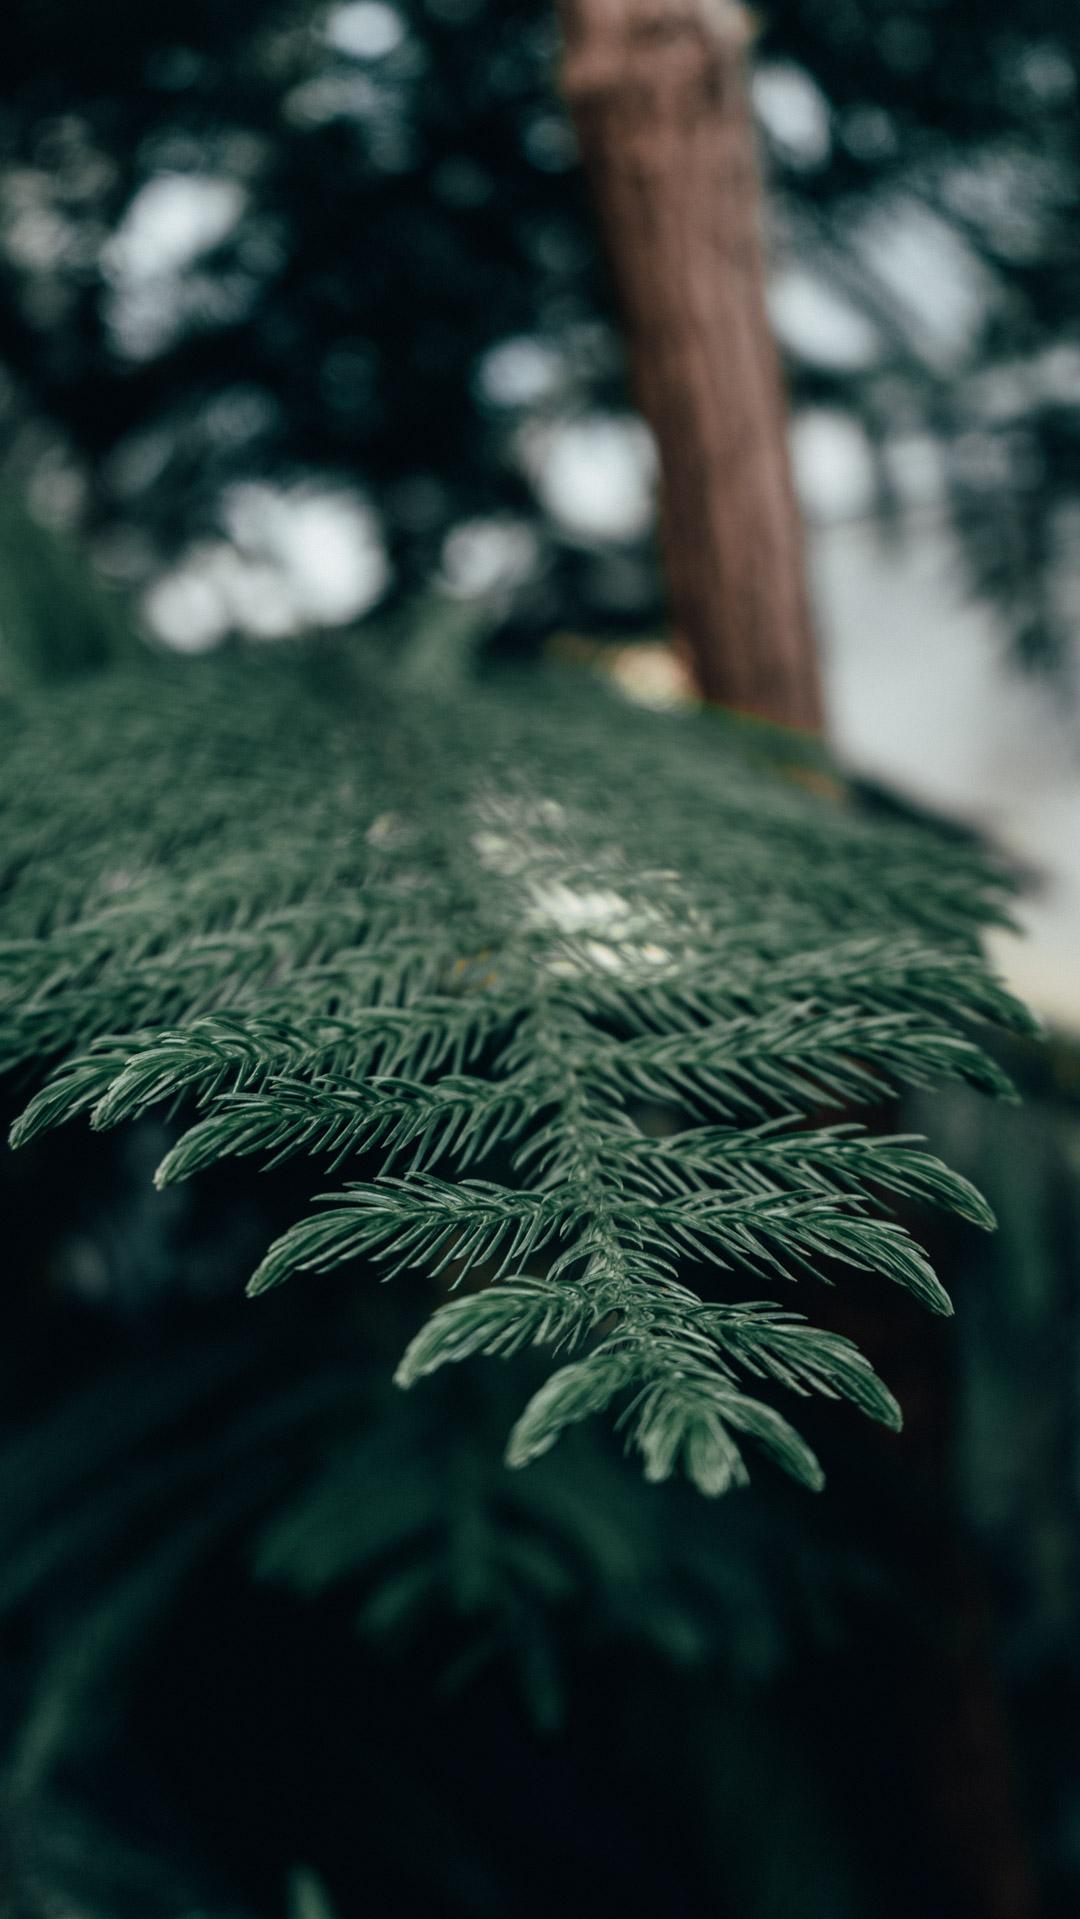 PASSIVE GREENHOUSE